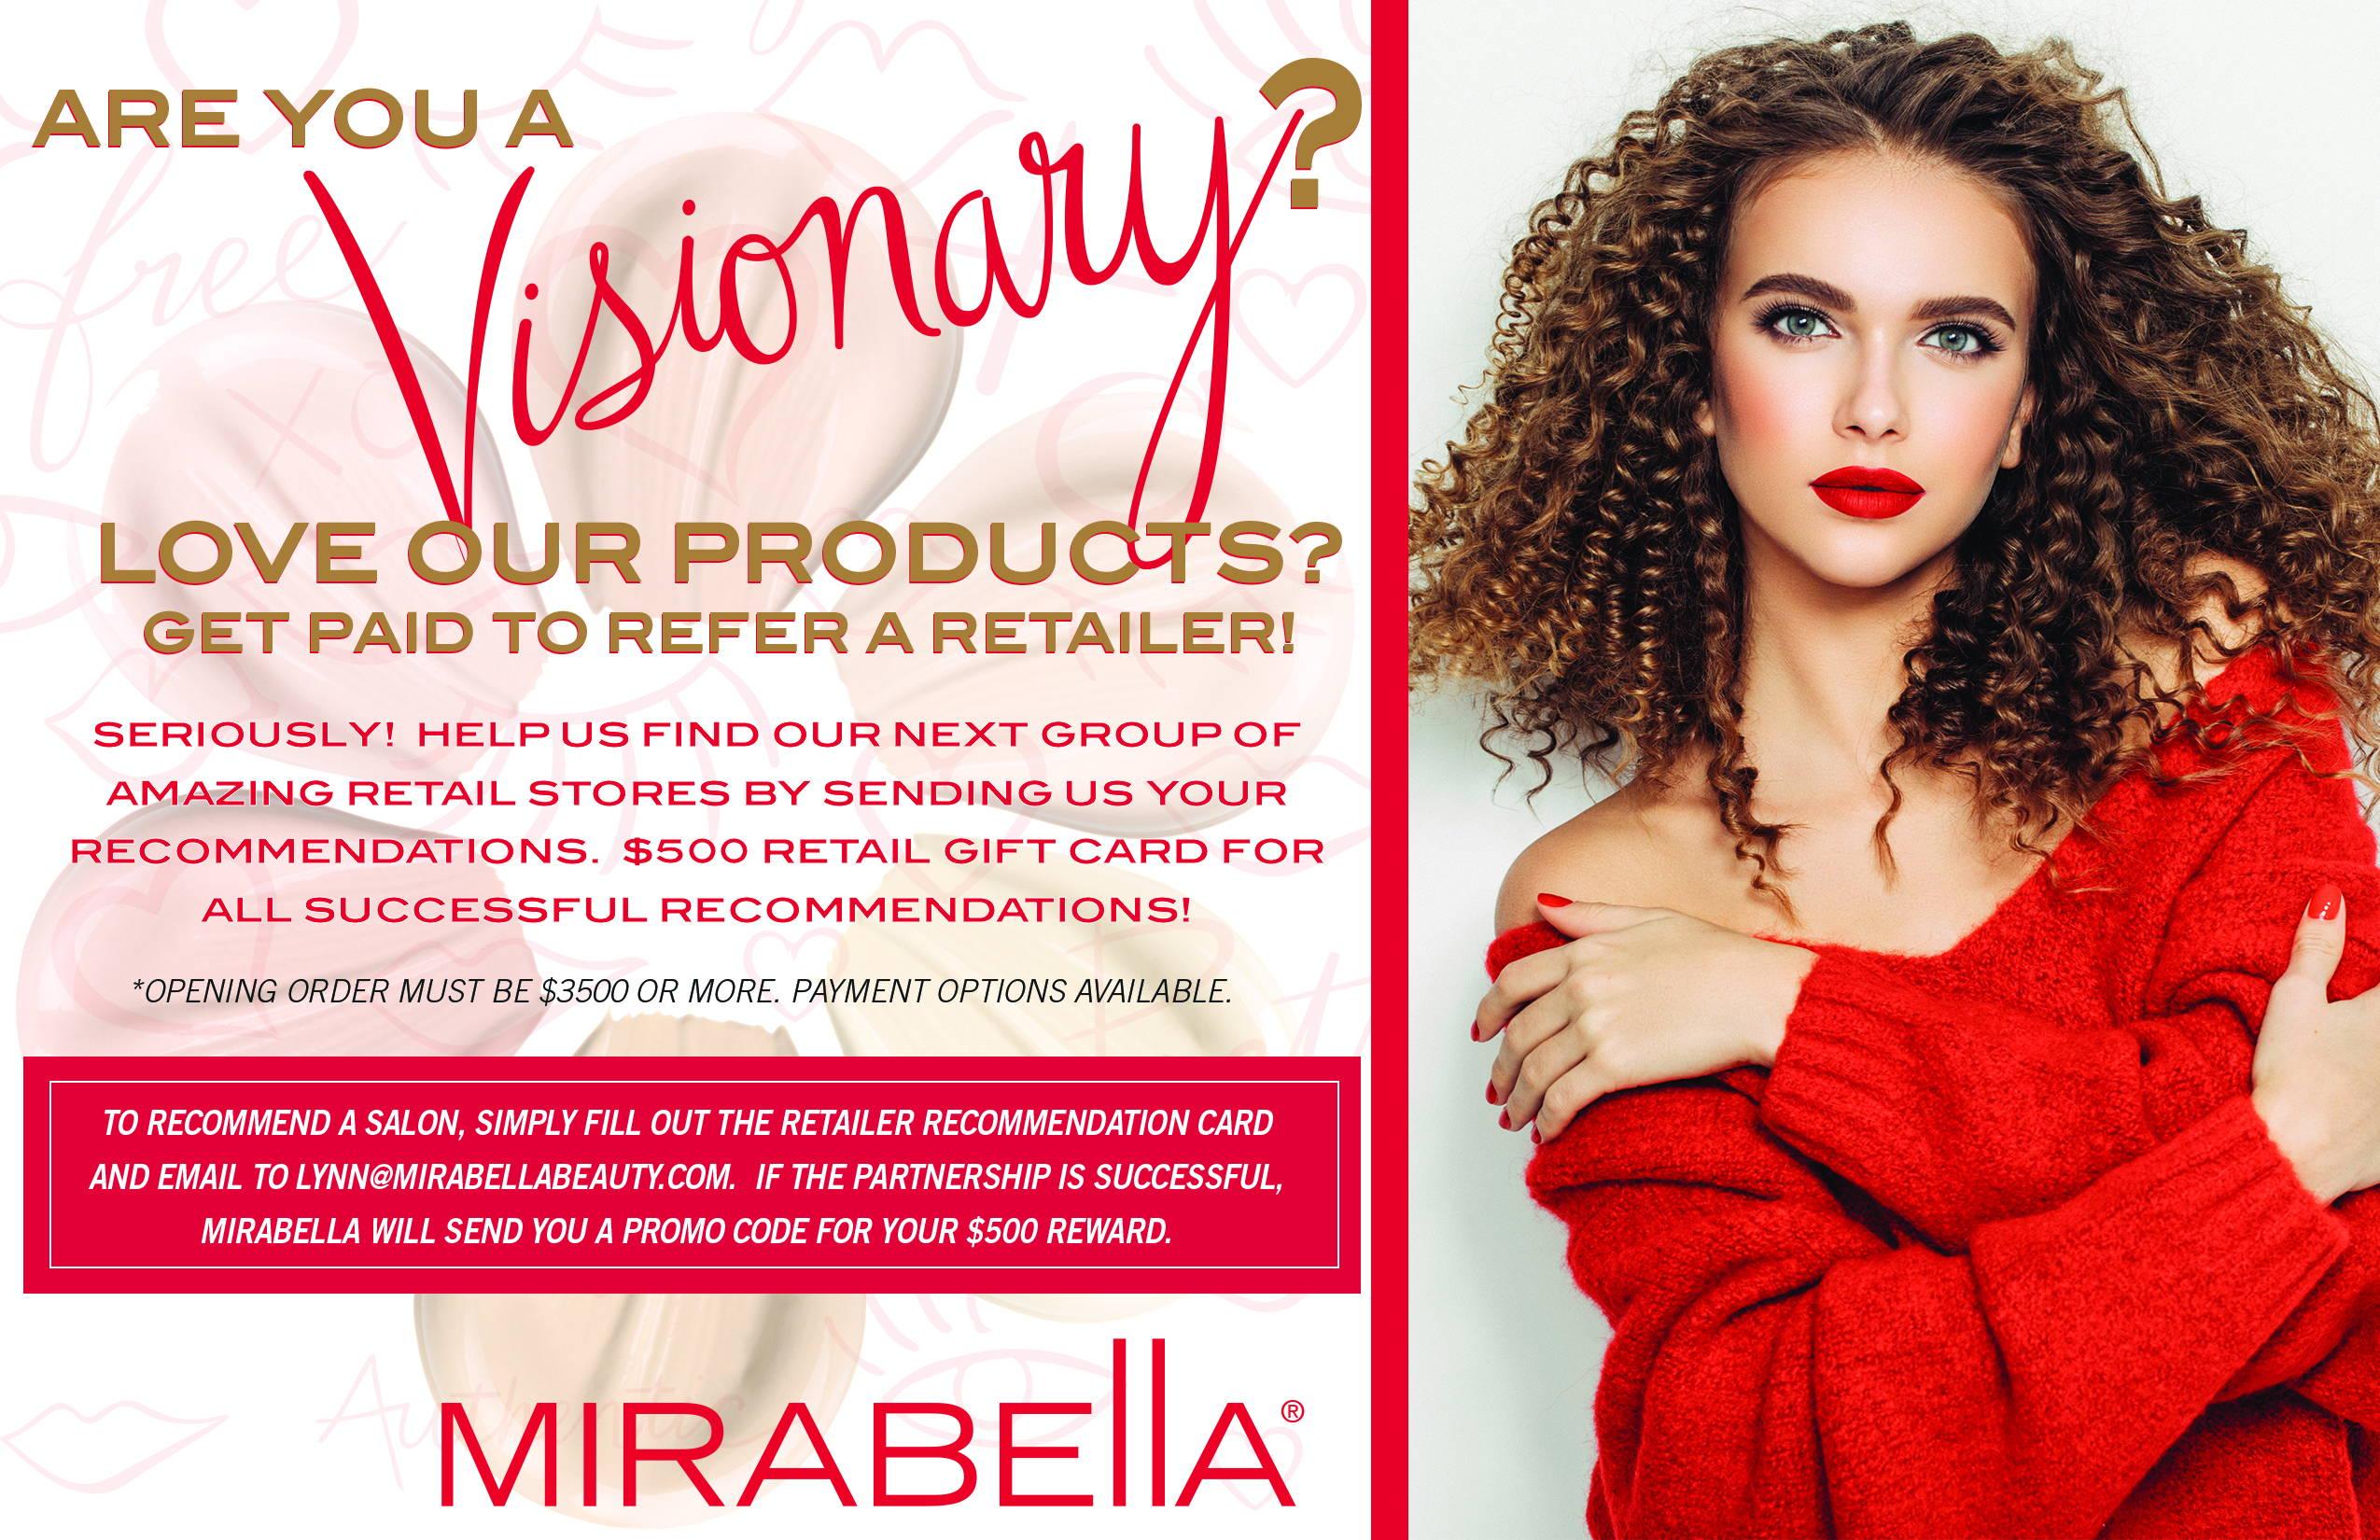 Mirabella Beauty Recommend a Salon